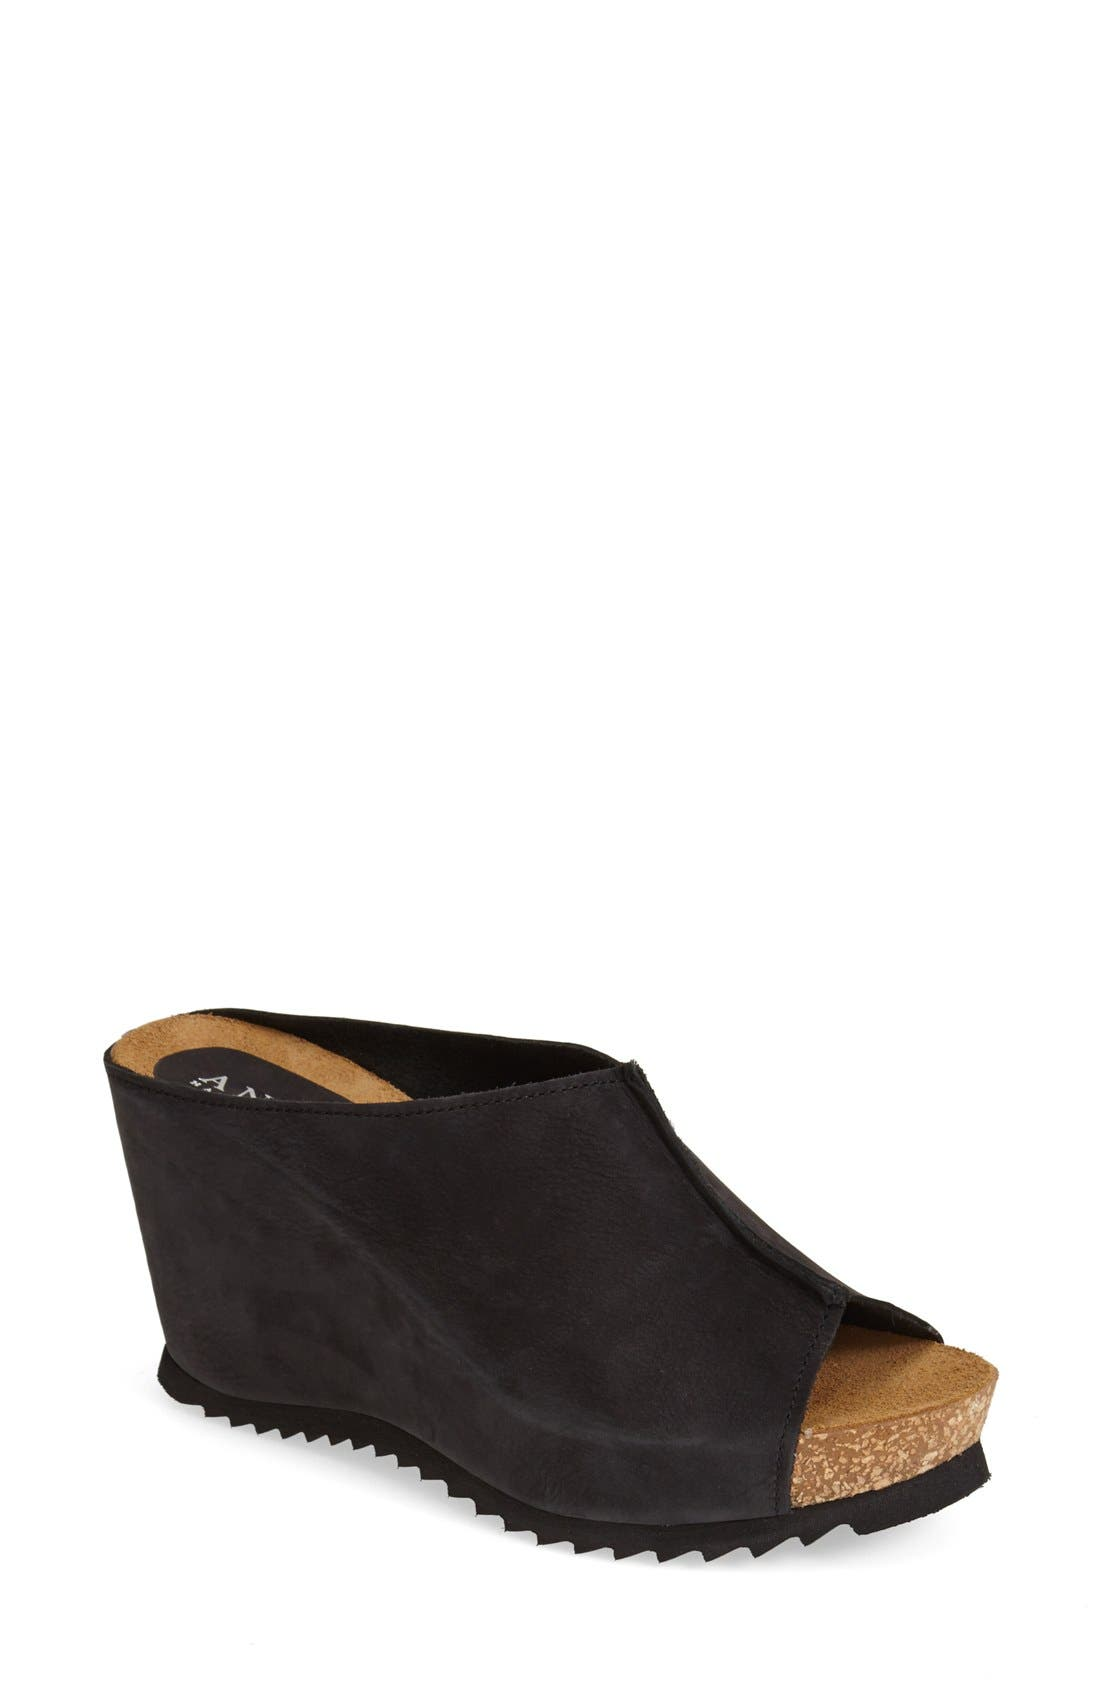 Alternate Image 1 Selected - Anyi Lu 'Sara' Nubuck Leather Peep Toe Mule Wedge (Women)